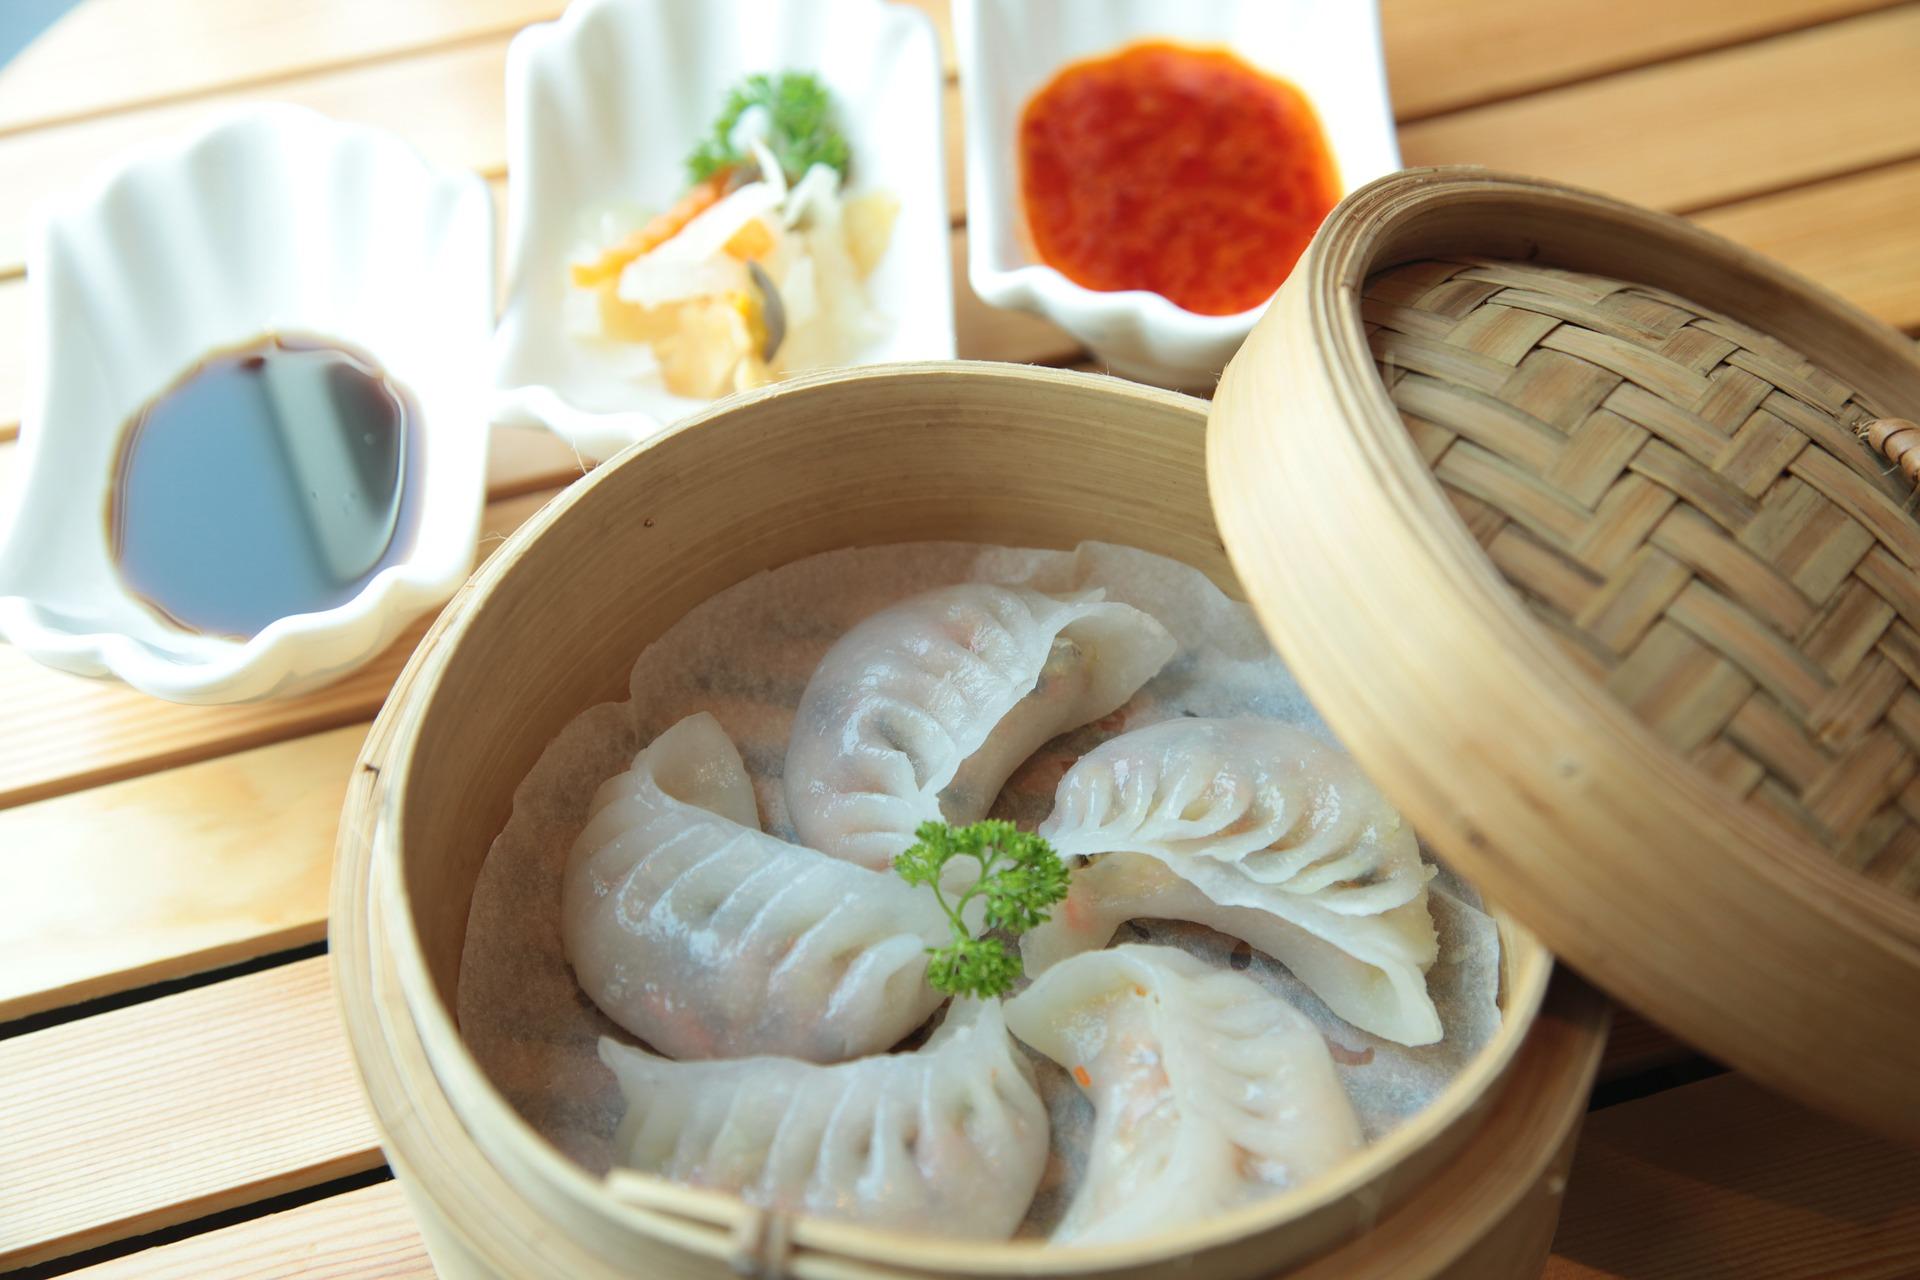 jiao zi dim sum - pixabay.com:de:photos:dimsum-chinesische-küche-chinesisch-2097947:.jpg